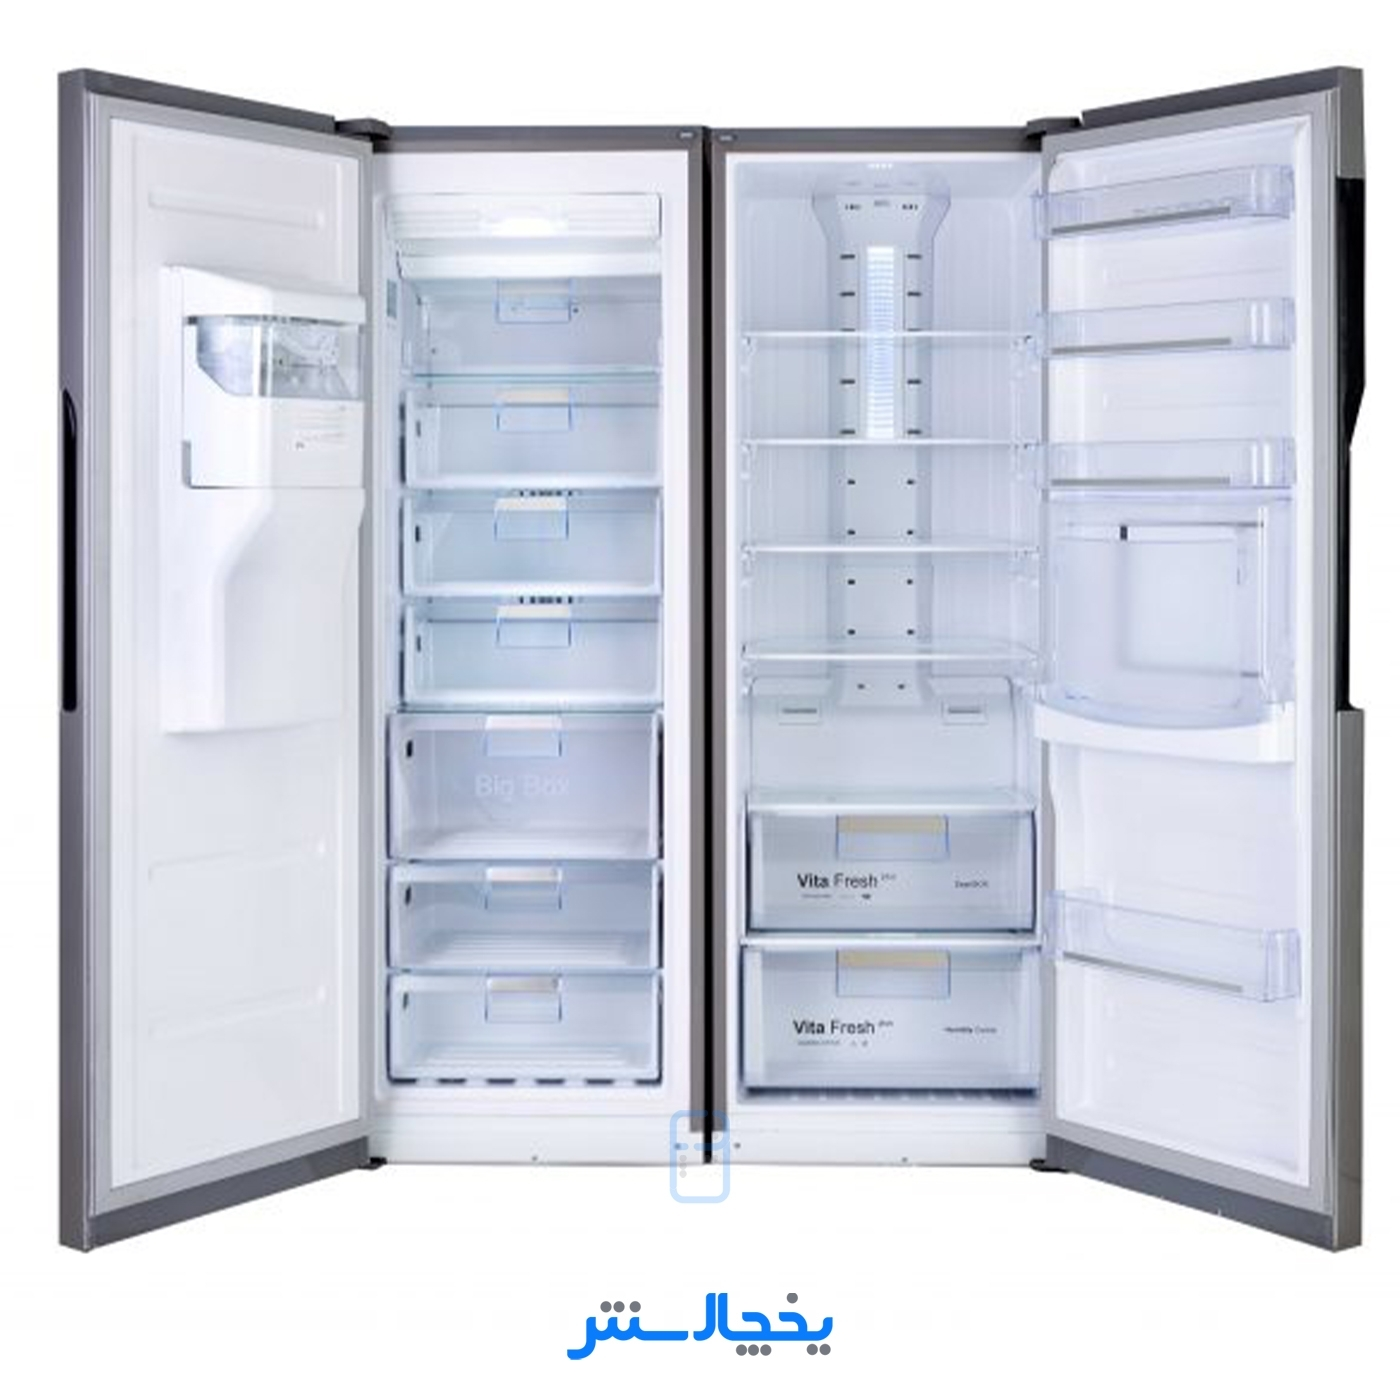 یخچال فریزر دوقلو هیمالیا مدل آلفا پلاس سیلور